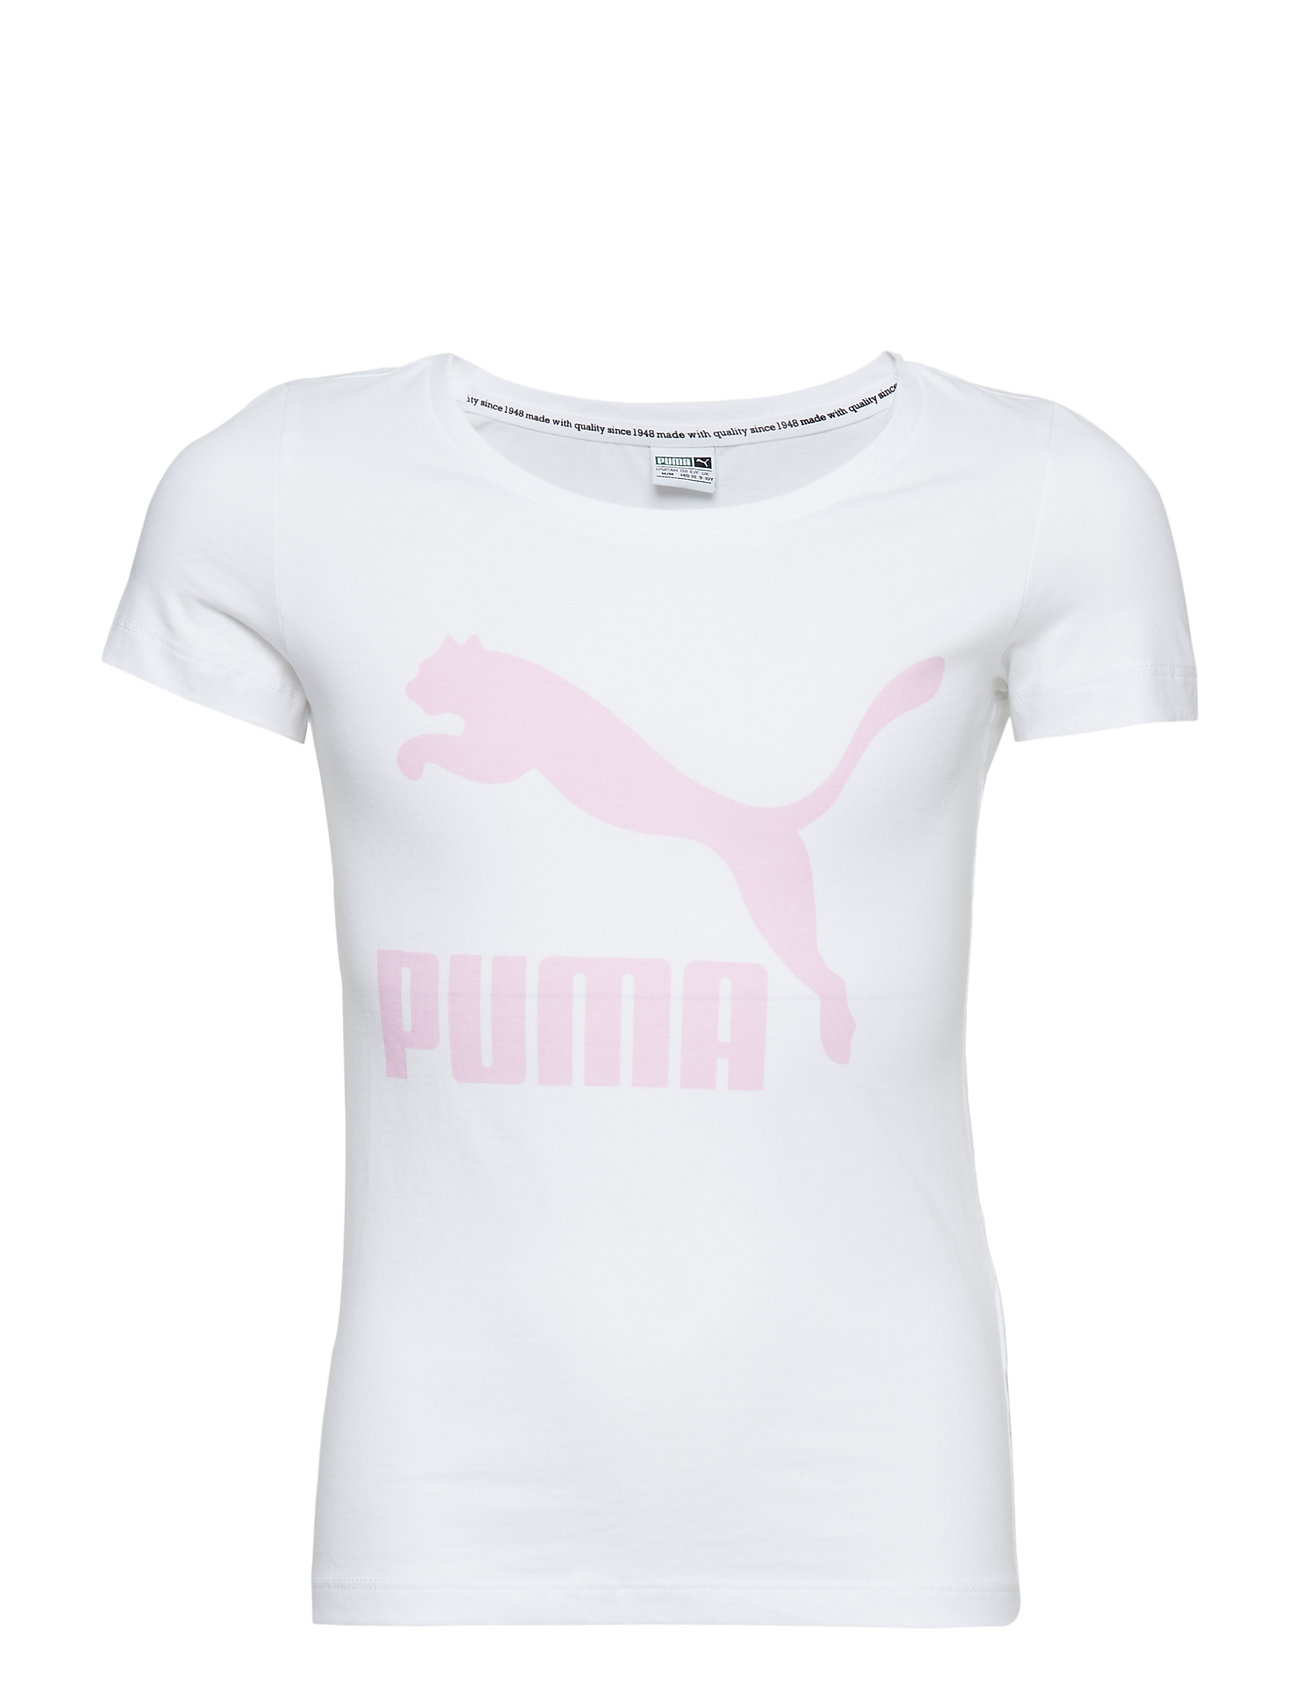 b6778671 Classics Logo Tee G (Puma White-pale Pink) (130 kr) - PUMA -   Boozt.com